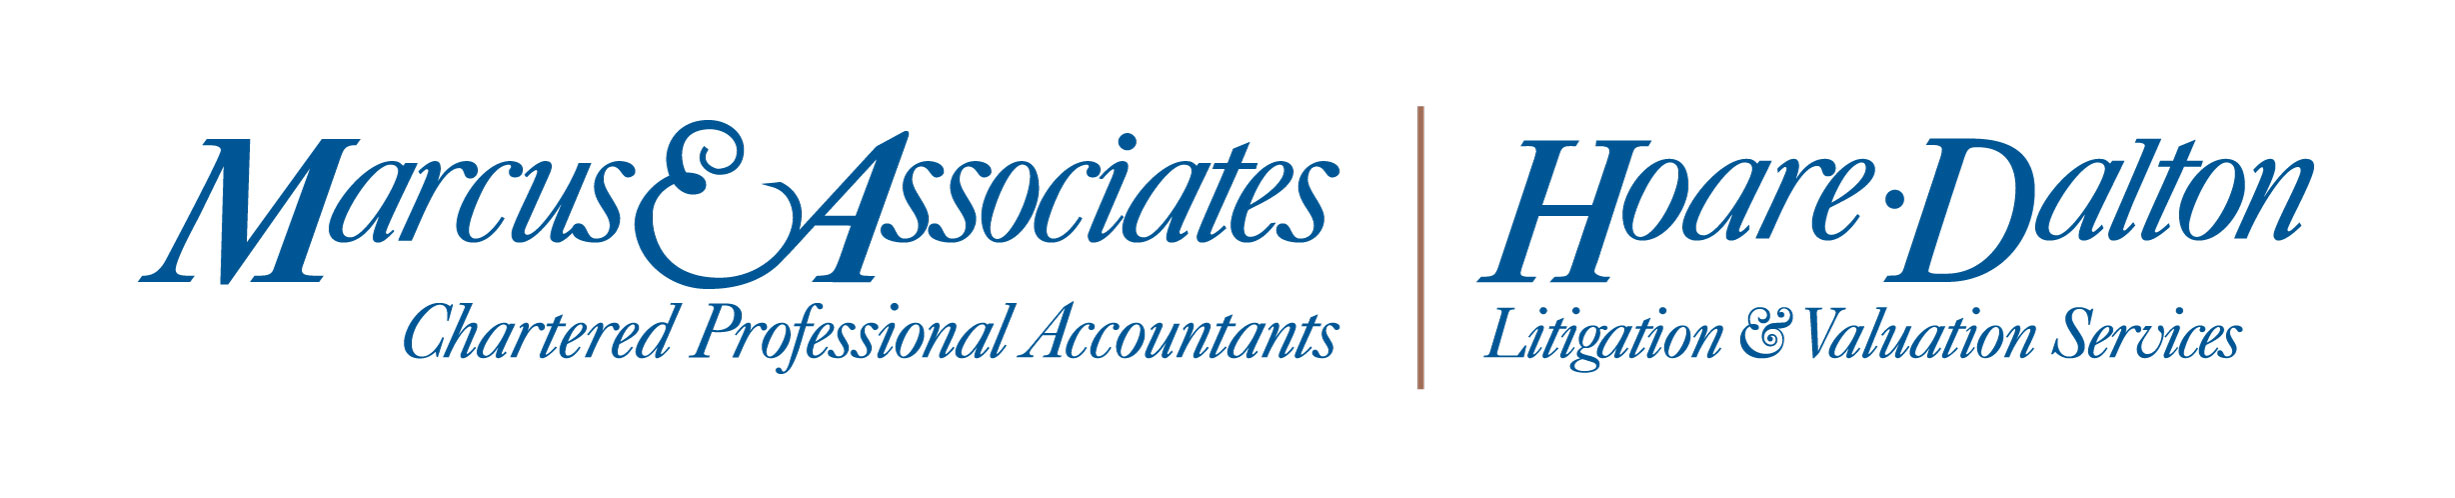 Marcus & Associates Hoare • Dalton